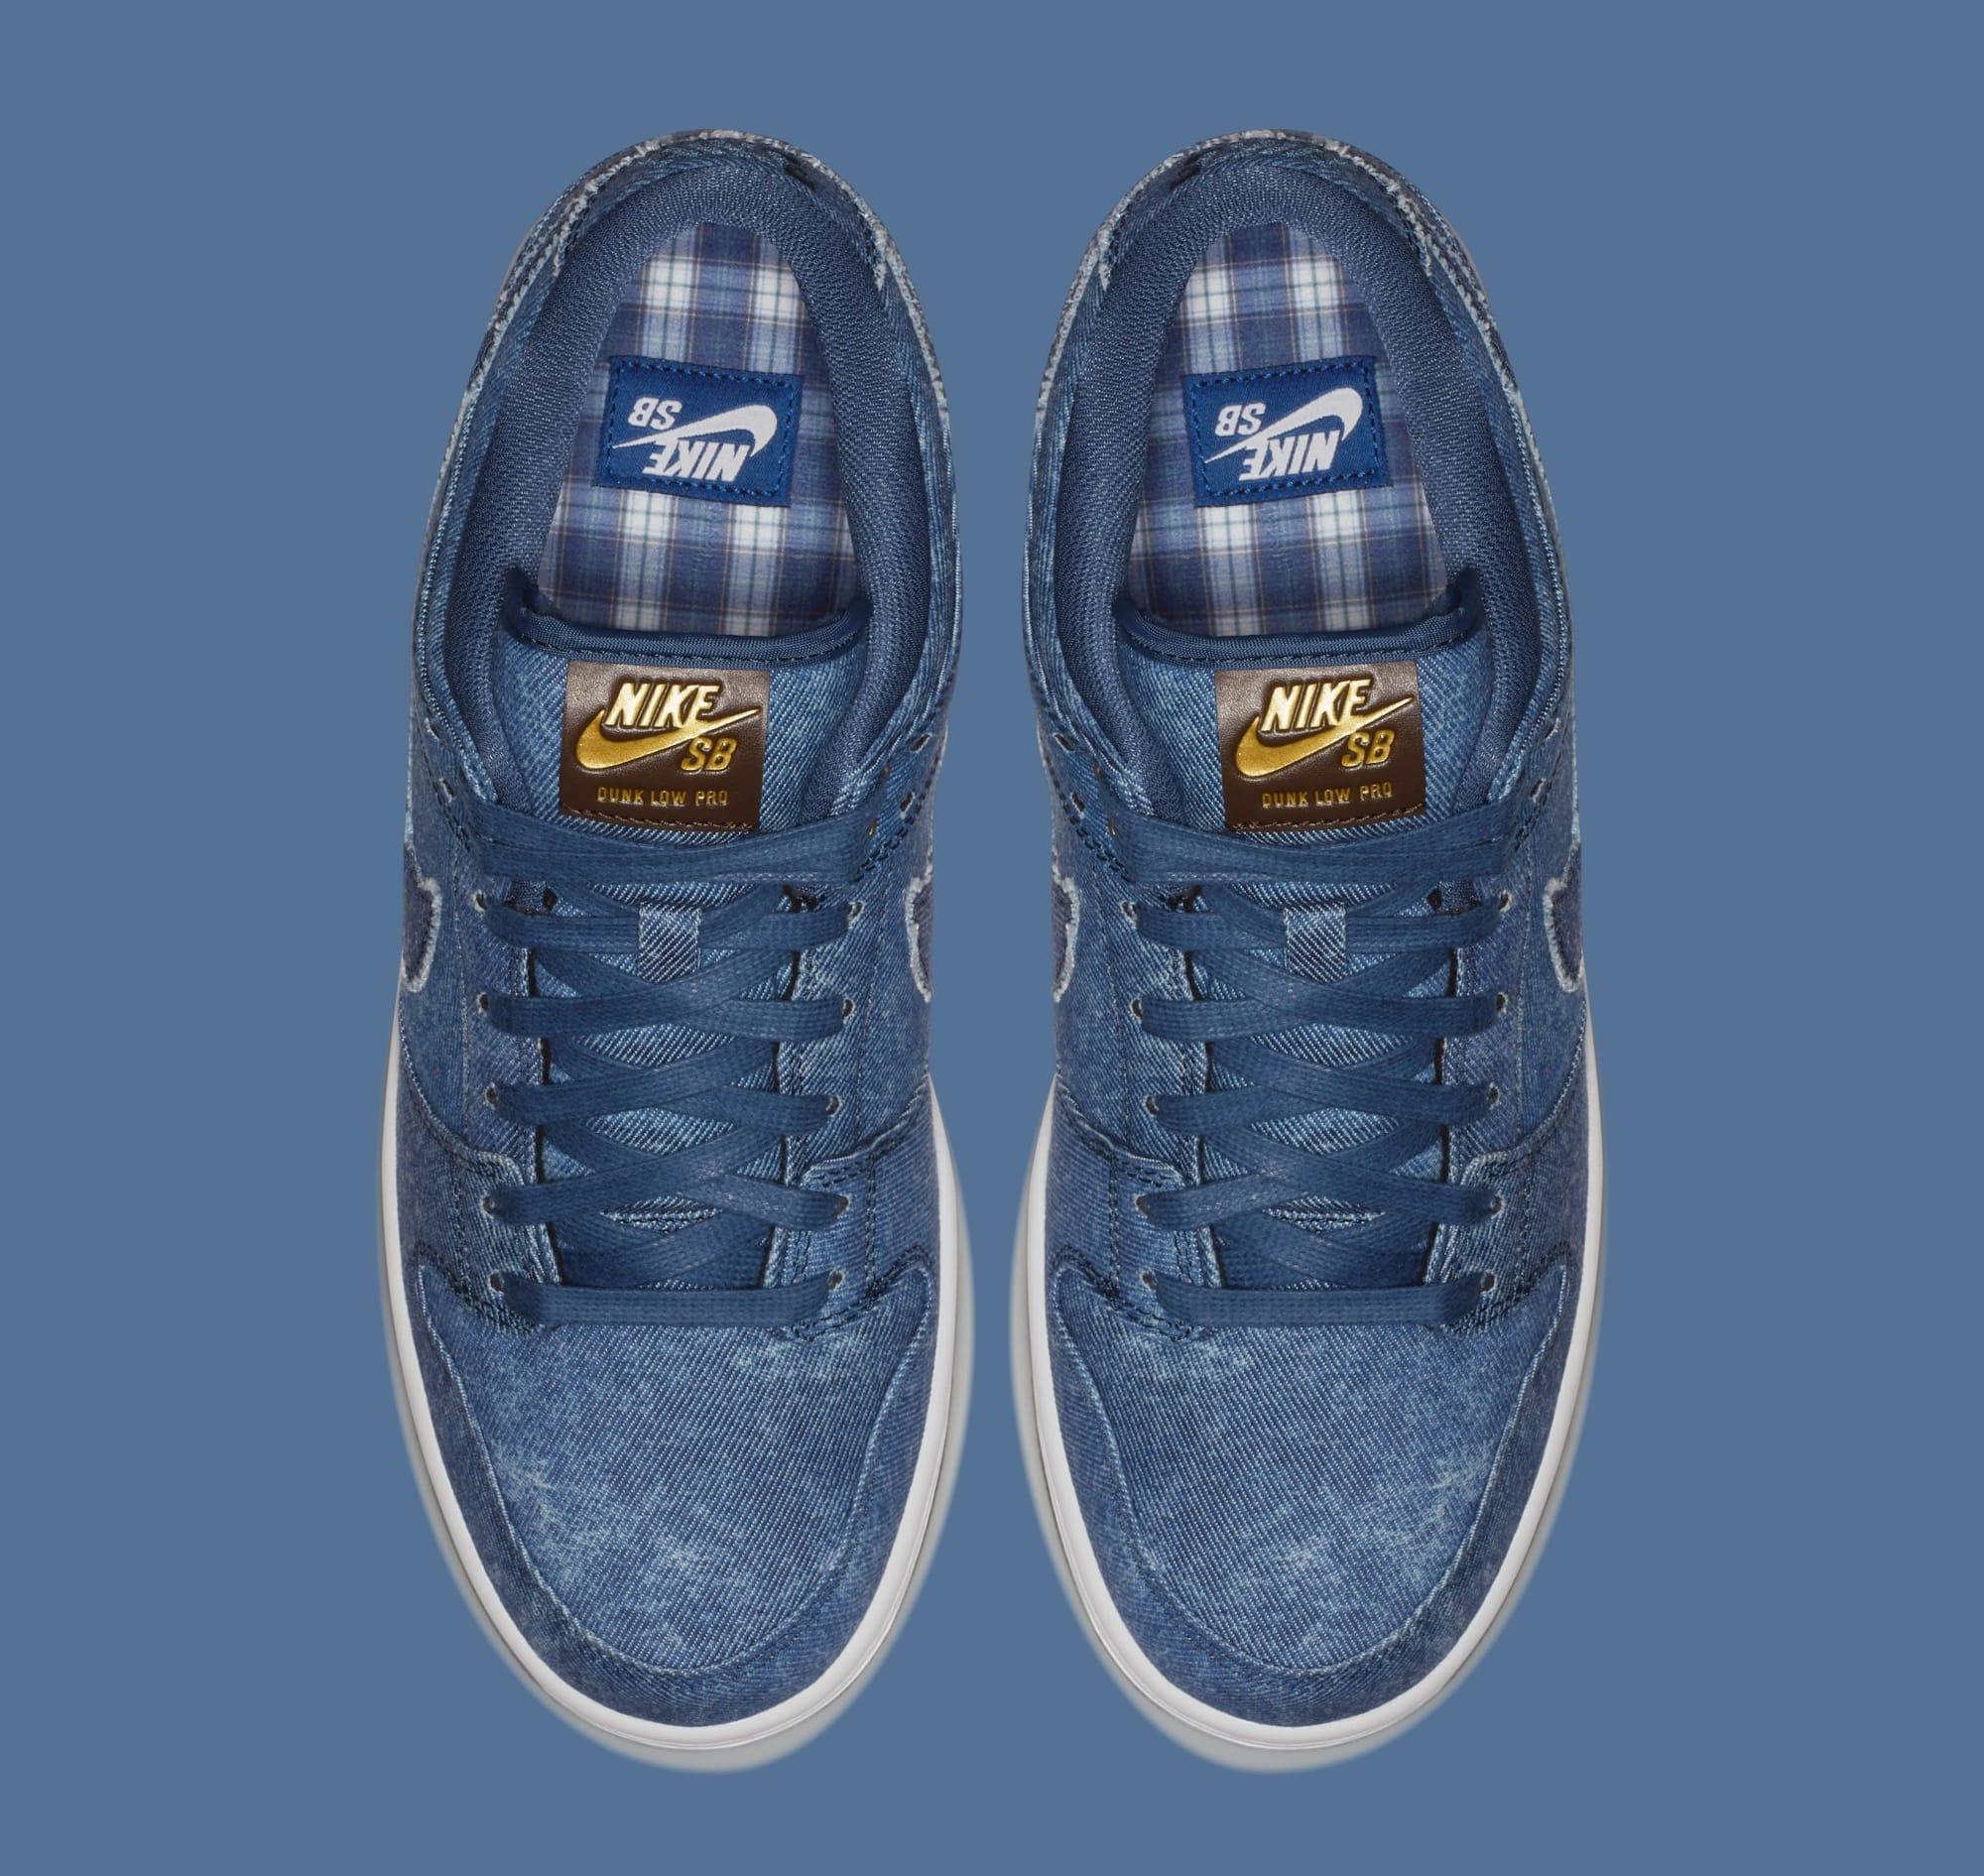 Nike SB Dunk Low 'Biggie' 883232-441 (Top)